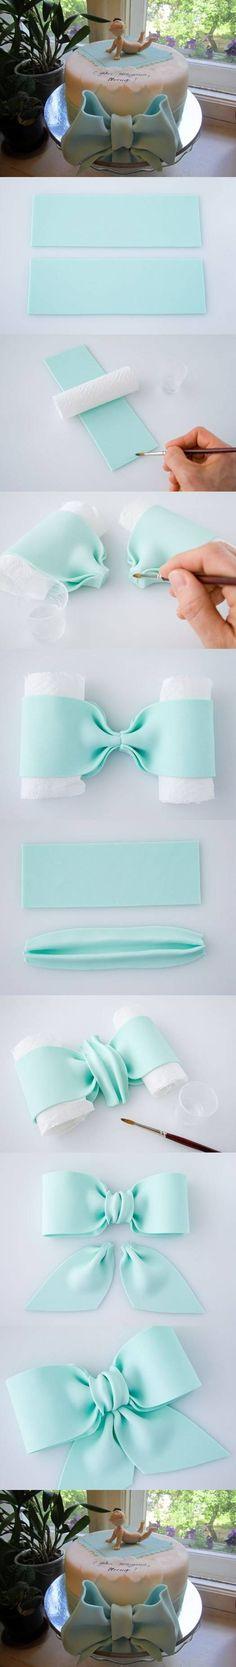 DIY Elegant Bow Tie Cake Decoration | iCreativeIdeas.com Like Us on Facebook ==> https://www.facebook.com/icreativeideas